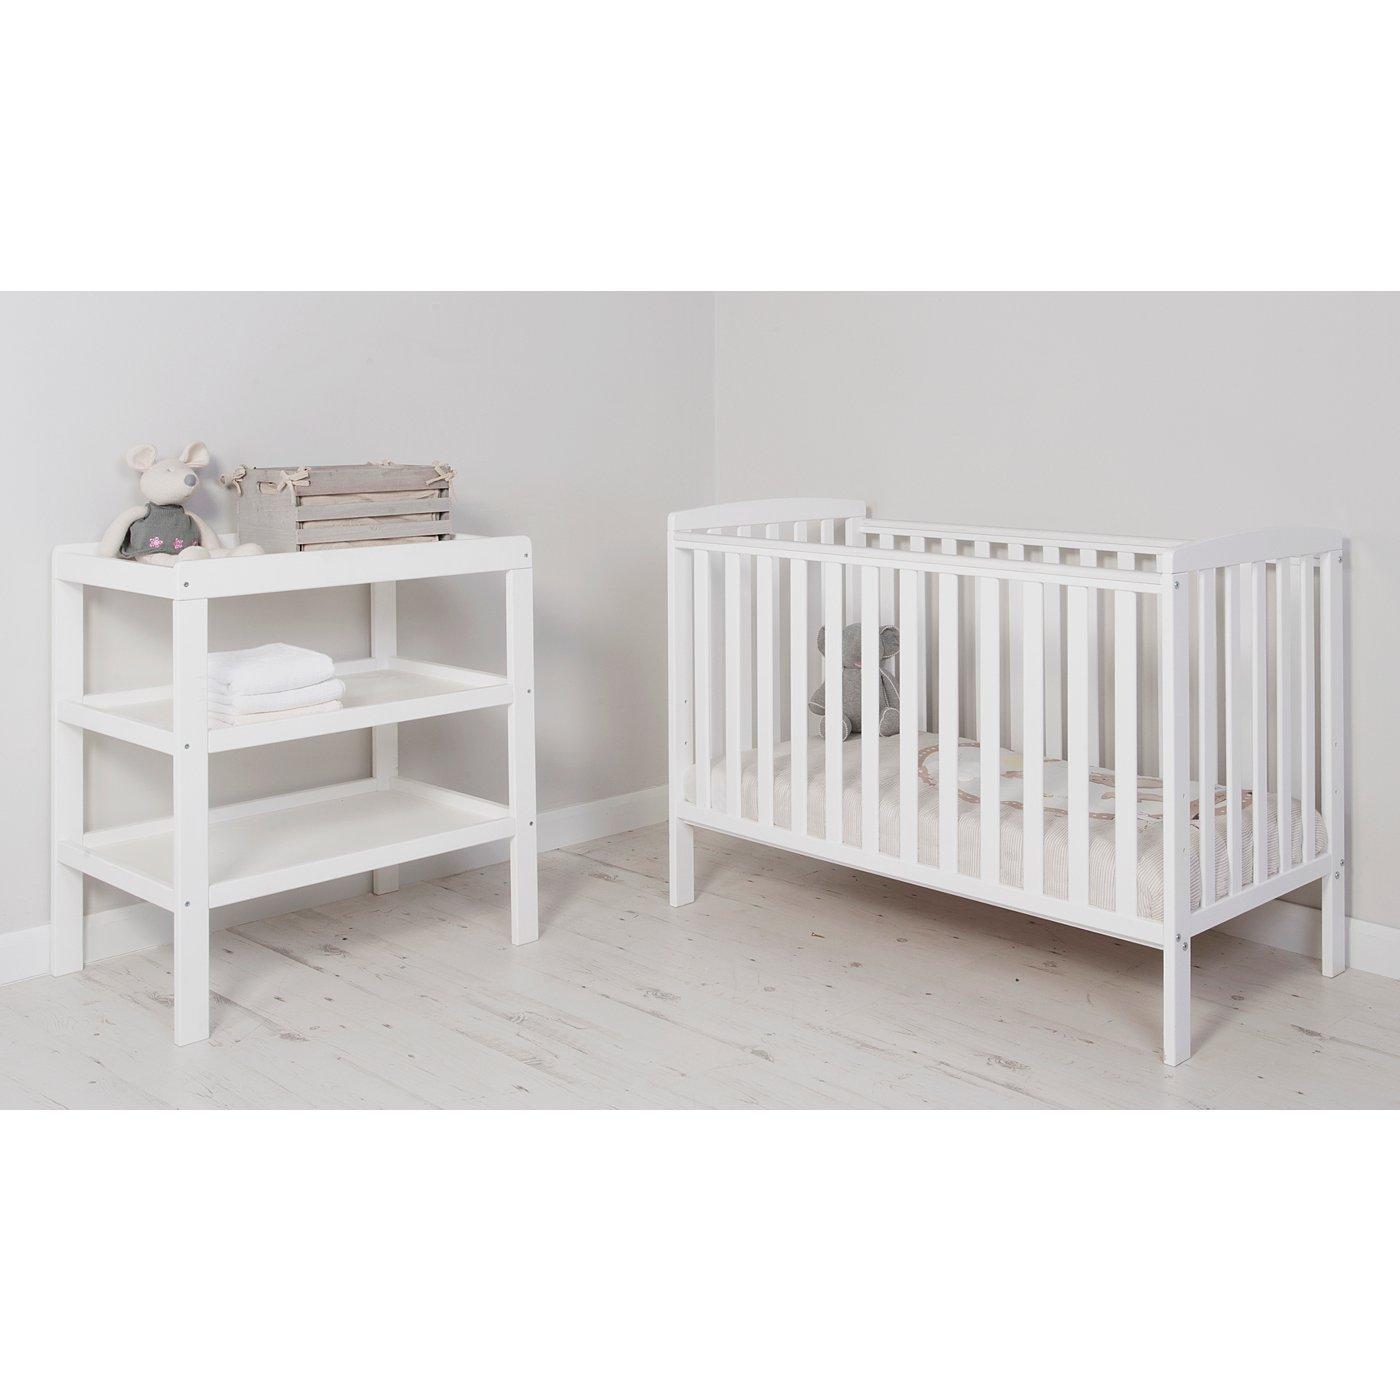 George Home Rafferty Nursery Furniture Range   White  Loading zoom. George Home Rafferty Nursery Furniture Range   White   Bedroom